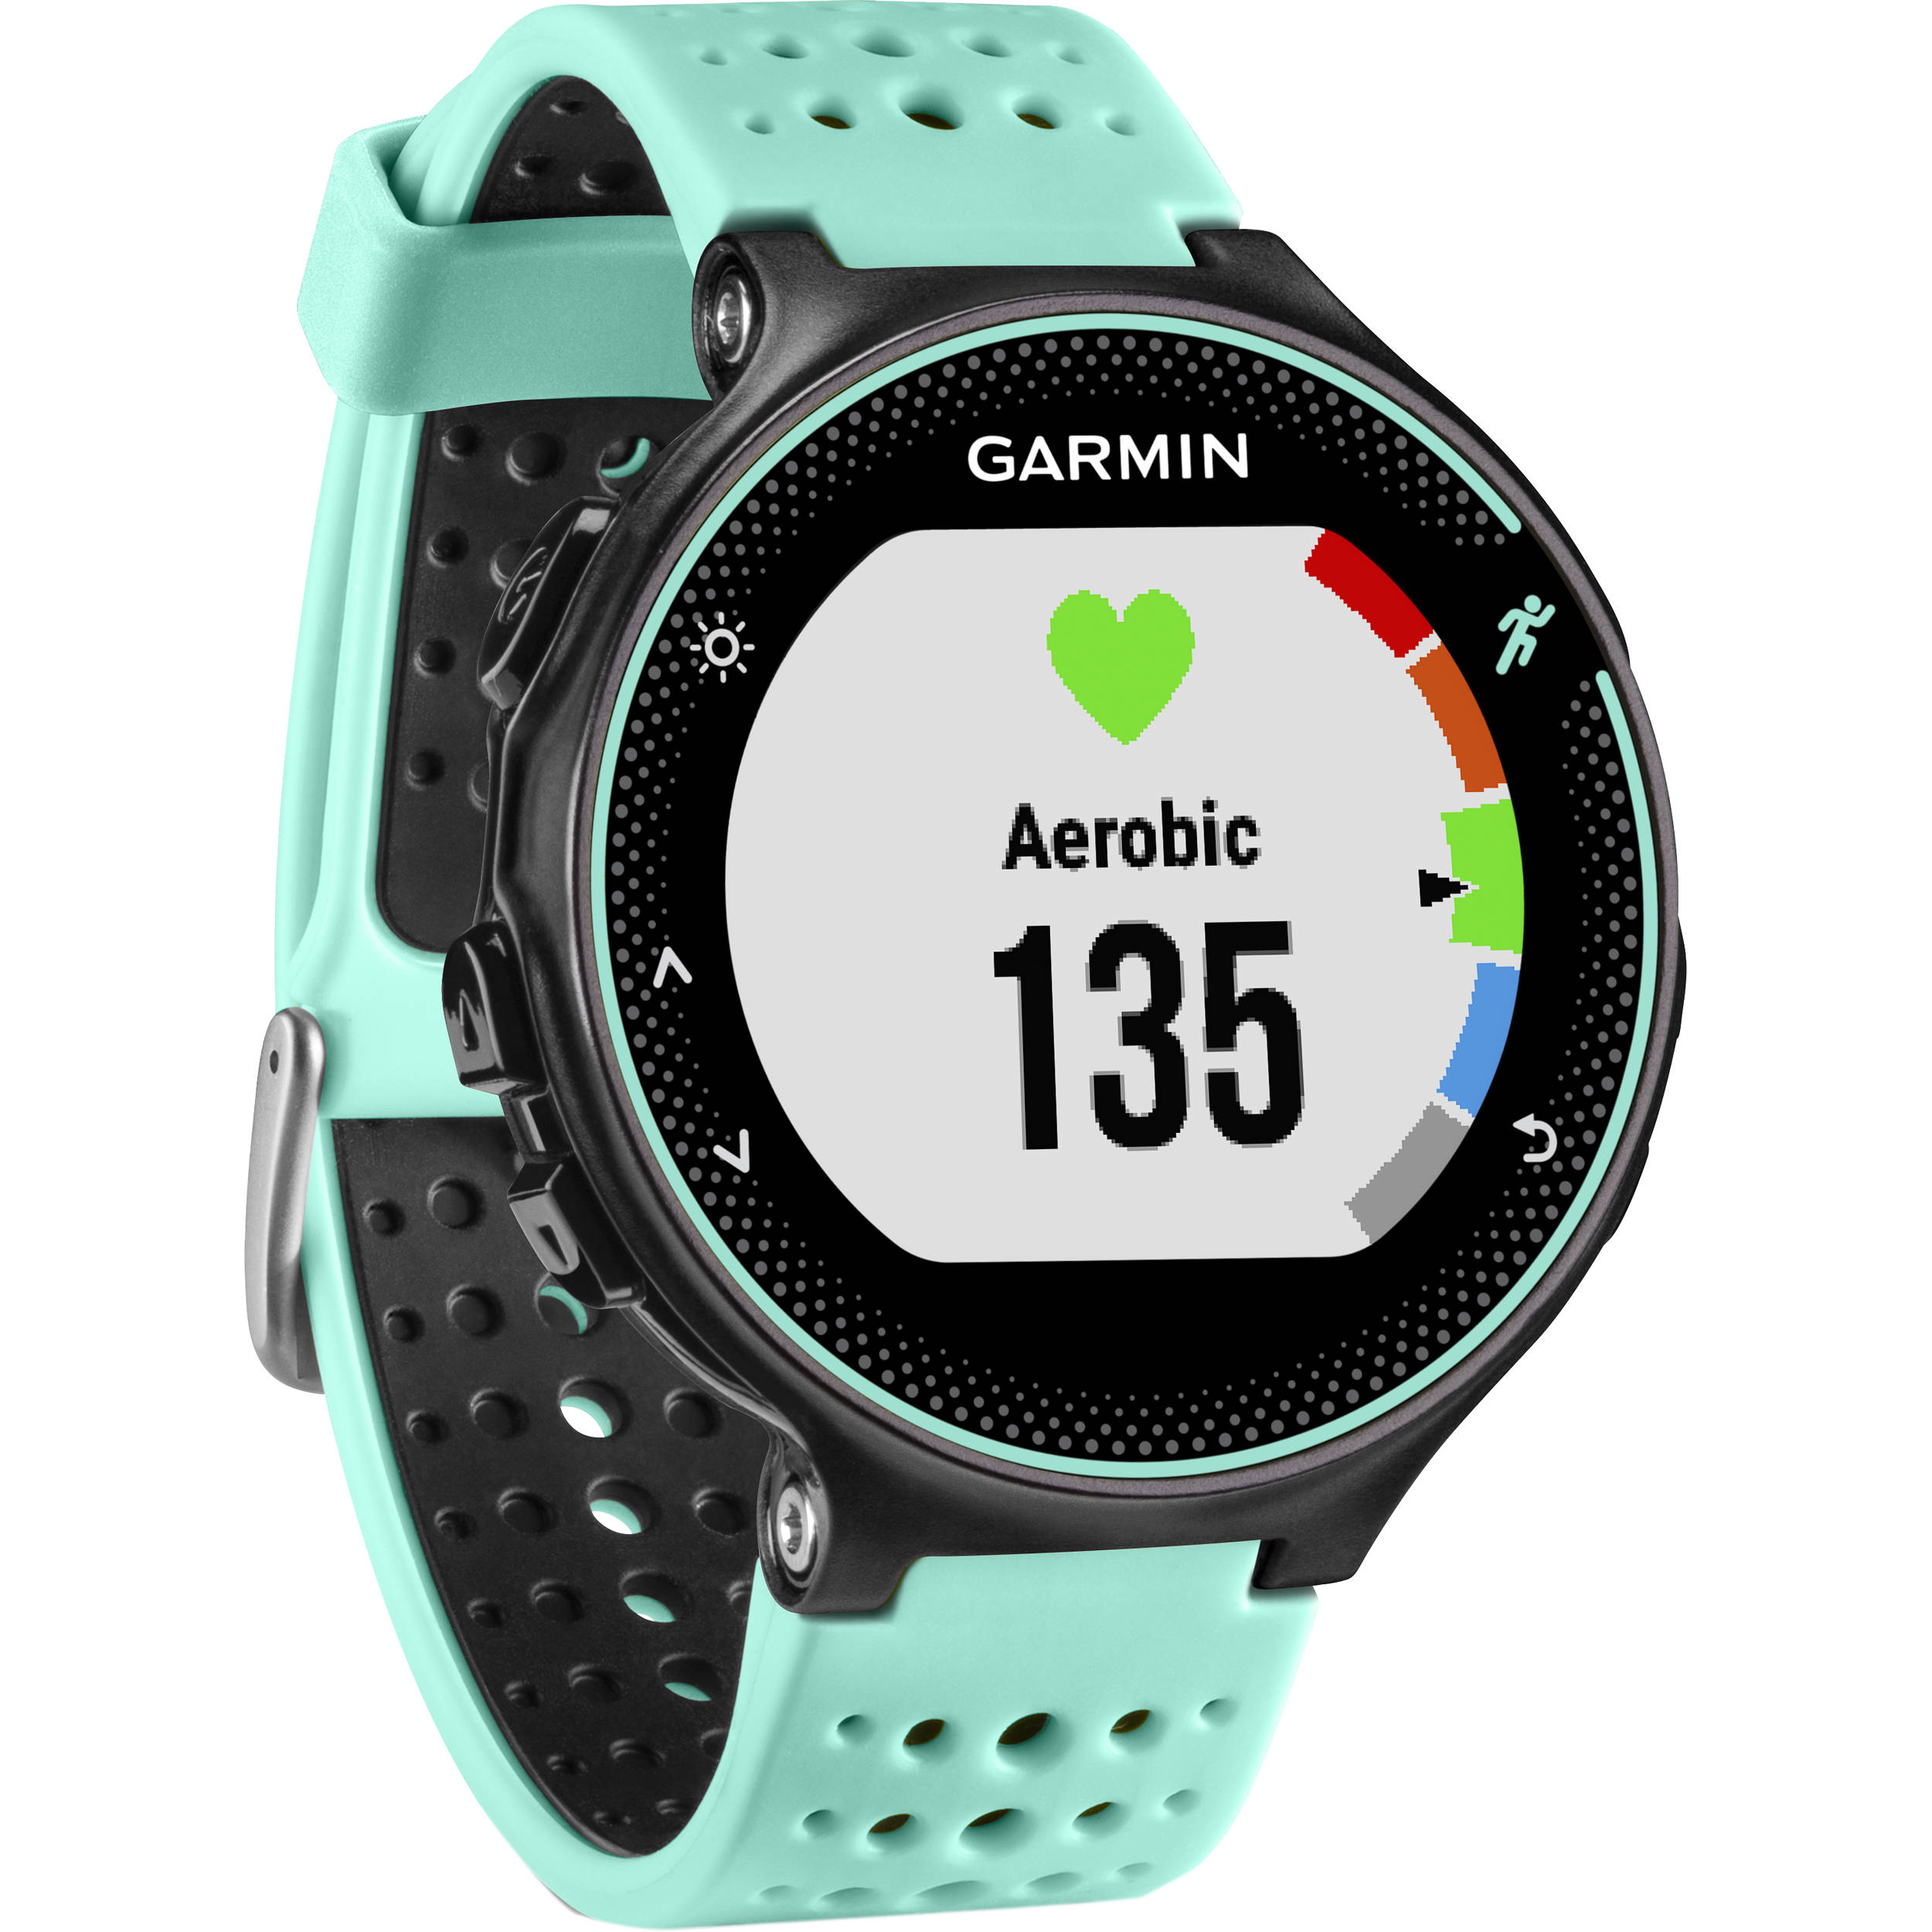 Garmin Gps Watch >> Garmin Forerunner 235 Gps Running Watch With Wrist Based Heart Rate Frost Blue